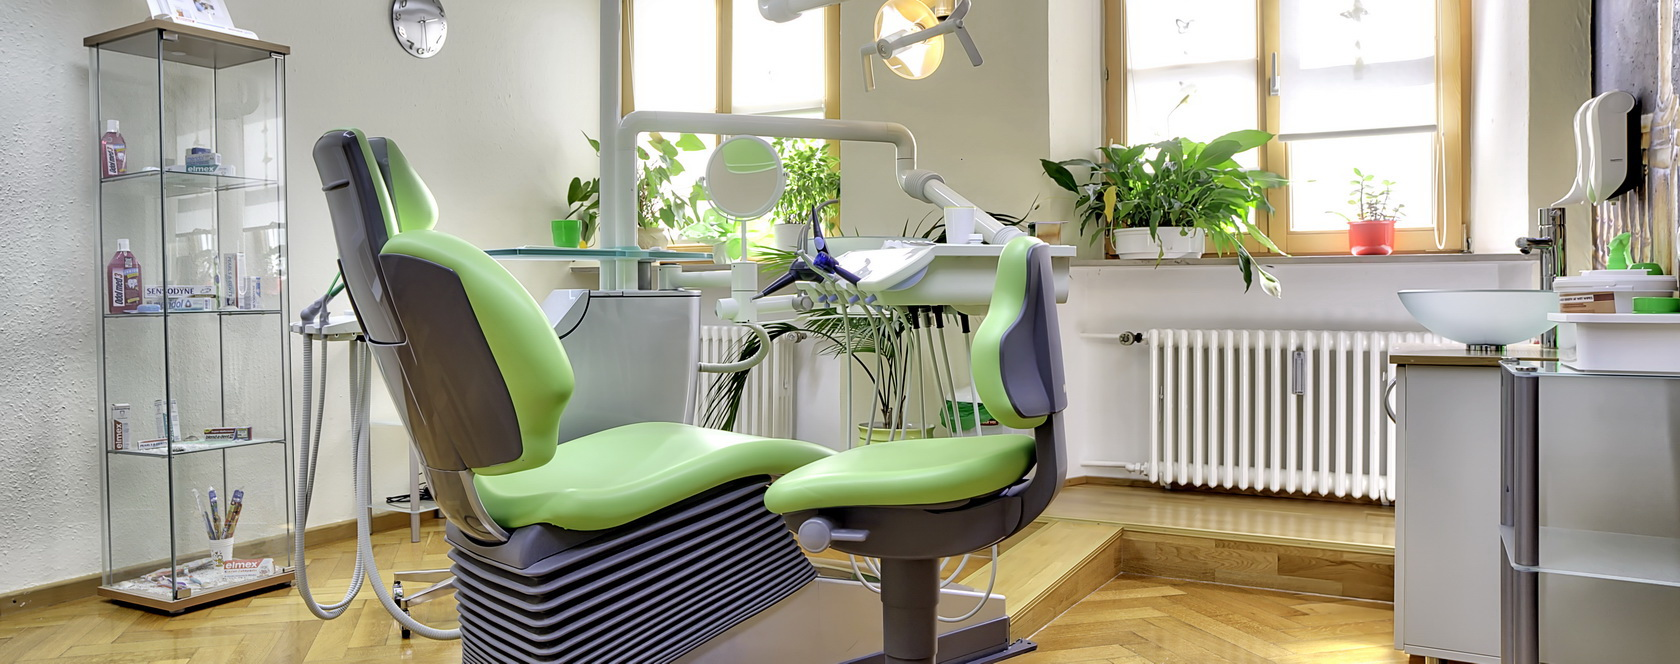 Zahnärztin Dr. Sabine Rulc - Behandlung